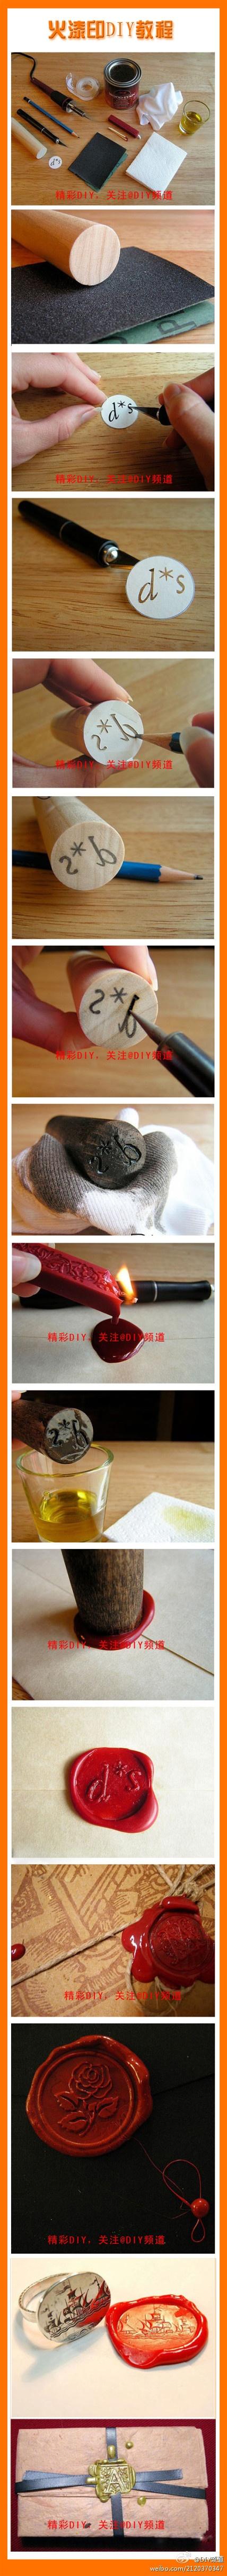 DIY wax stamper: Seals Wax, Diy Crafts, Envelope, Wax Seals Stamps, Wedding Invitations, Homemade Wax, Cool Ideas, Wax Stamps, Diy Wax